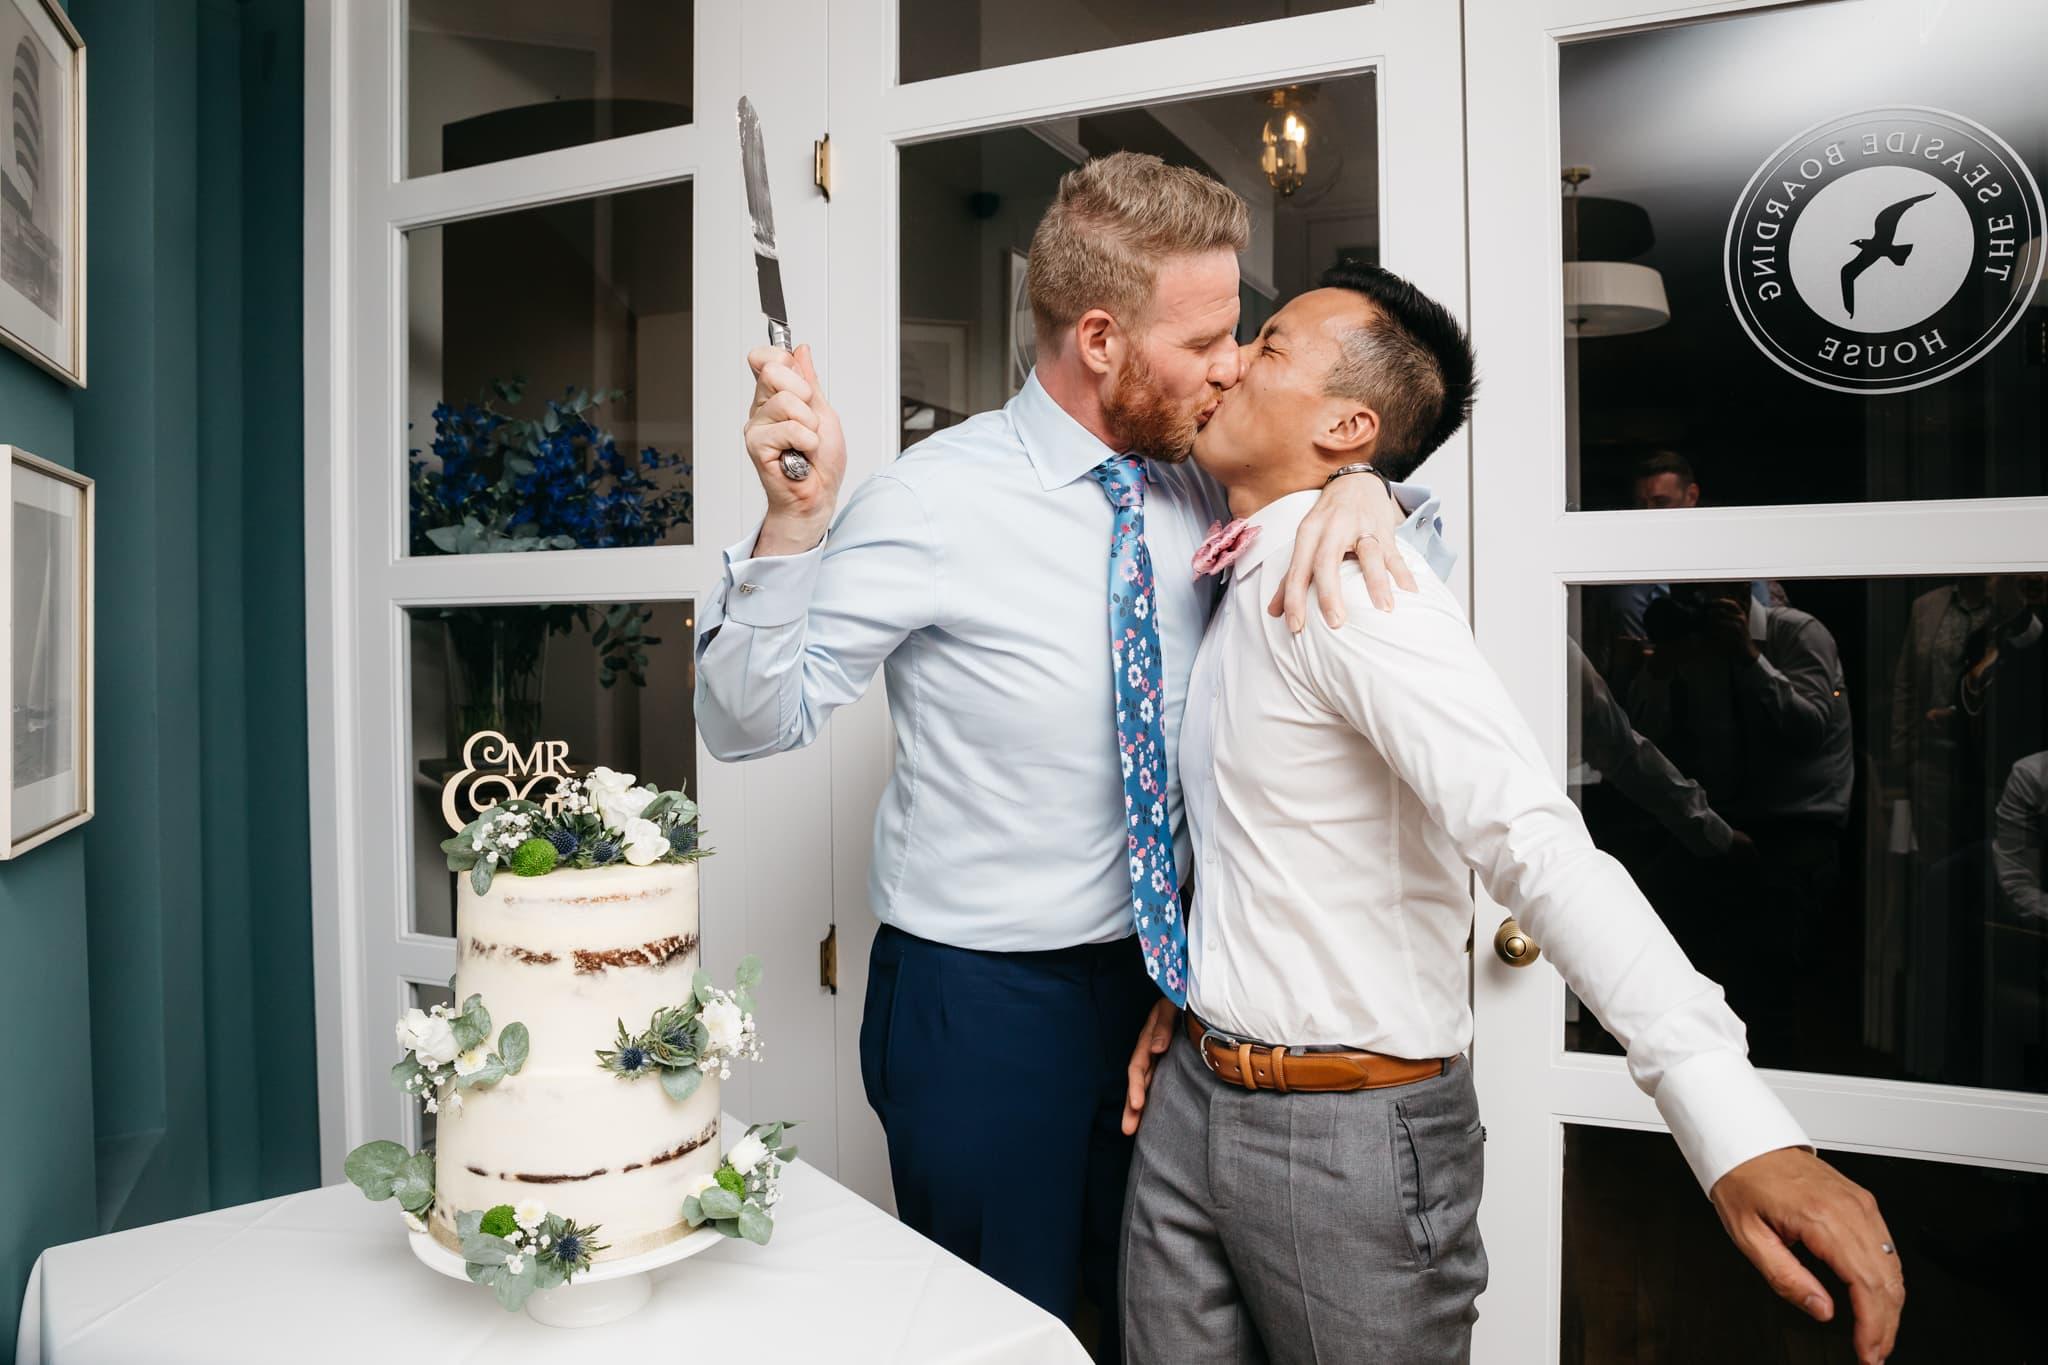 Same sex couple cutting their wedding cake